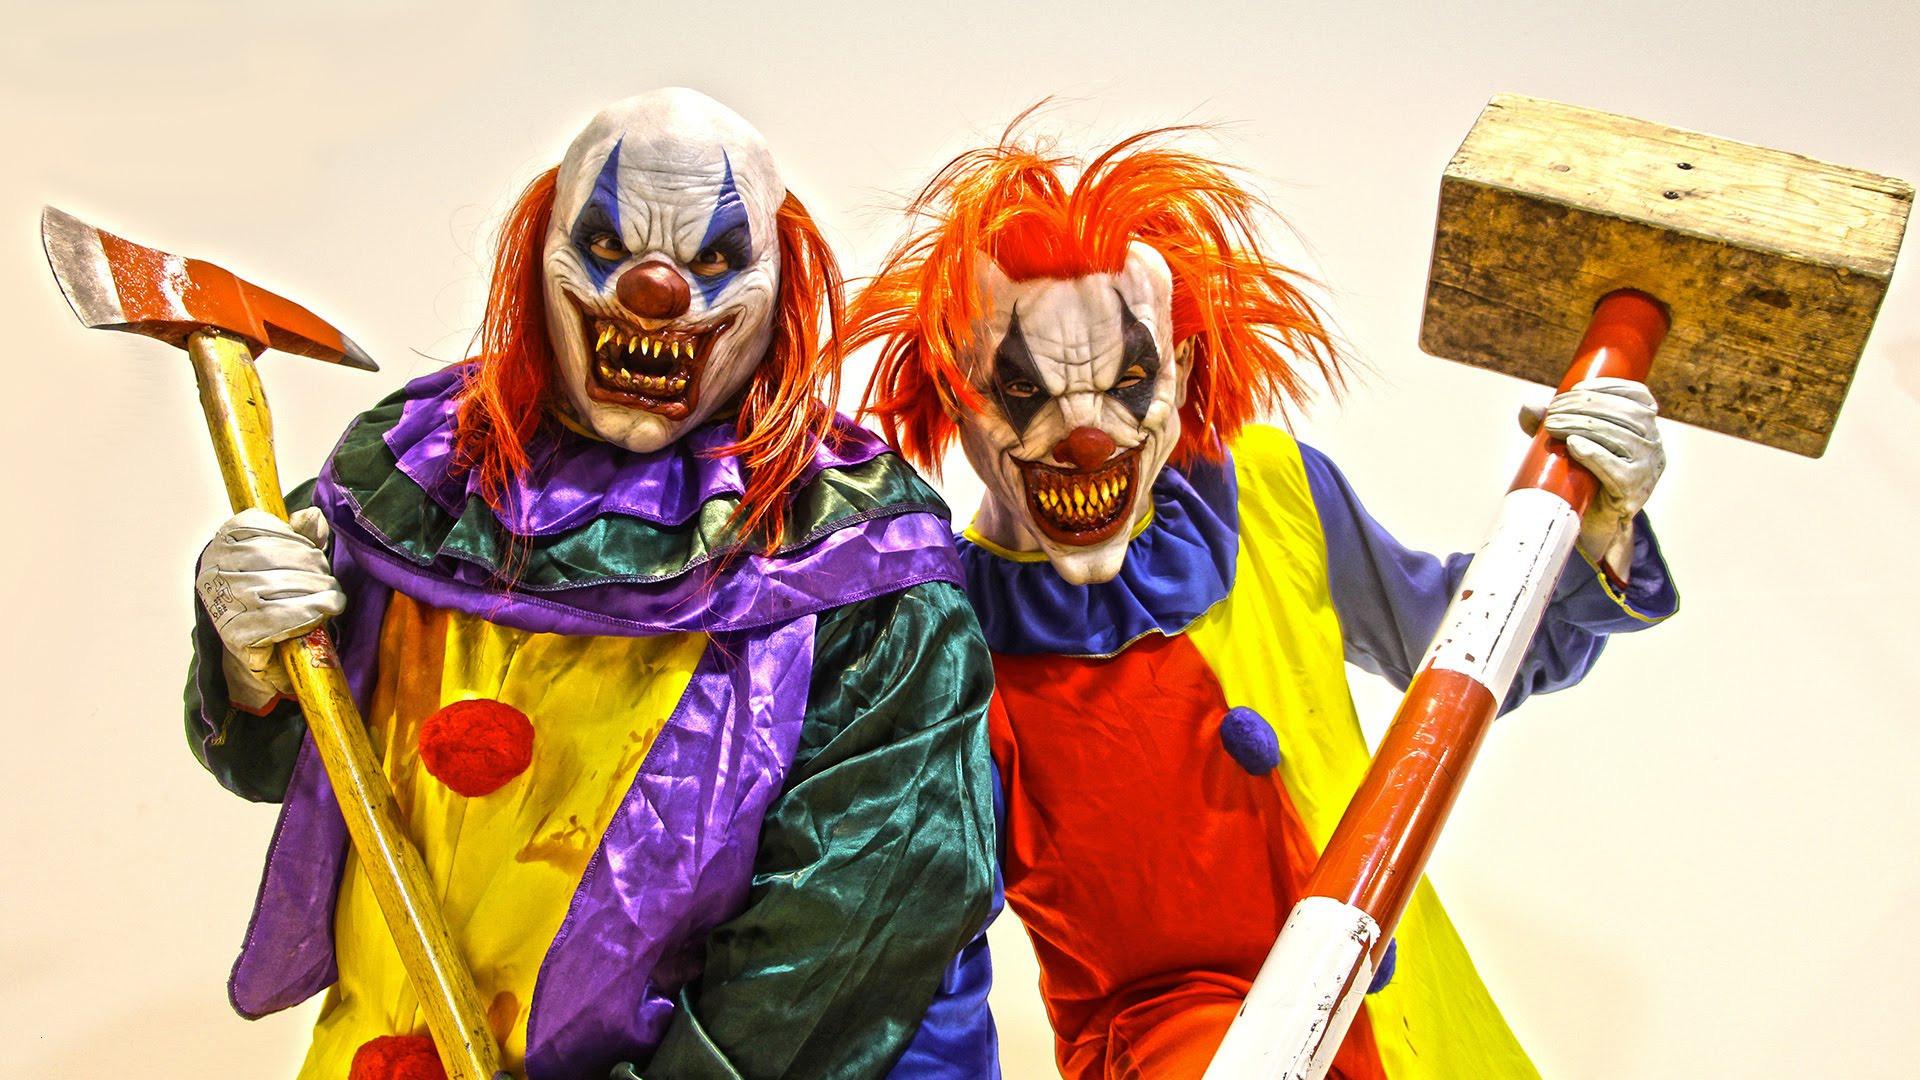 Fasching Ausmalbilder Clown Neu Killer Clown 7 Resurrection Scare Prank Genial Ausmalbilder Zirkus Das Bild